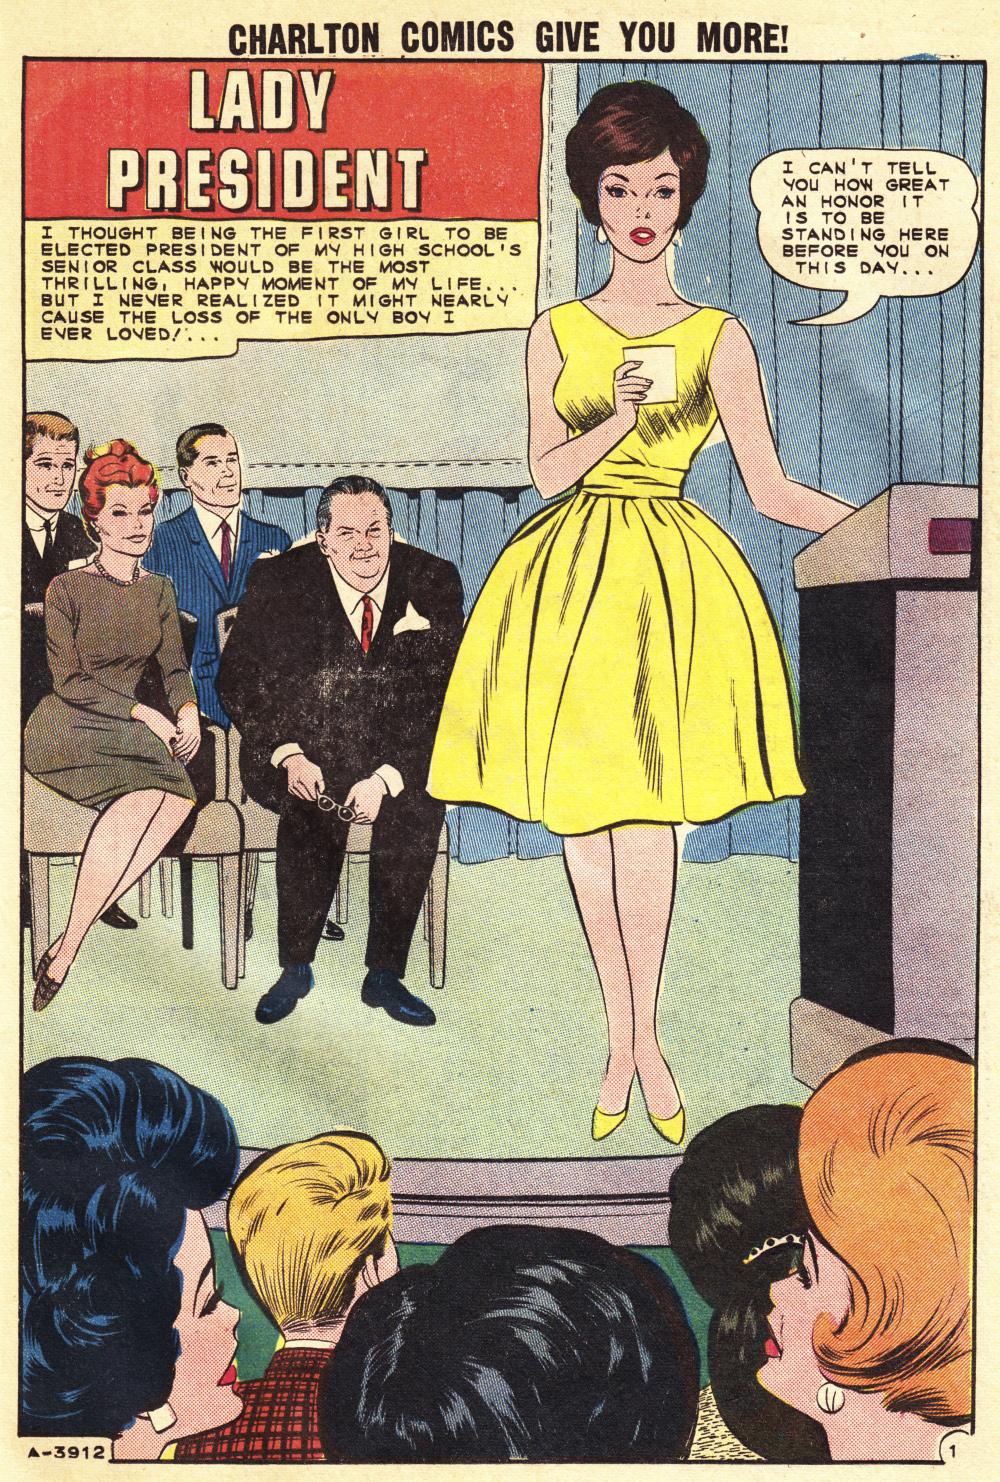 Woman President Romance Comic Book Sweethearts #79 (1964)